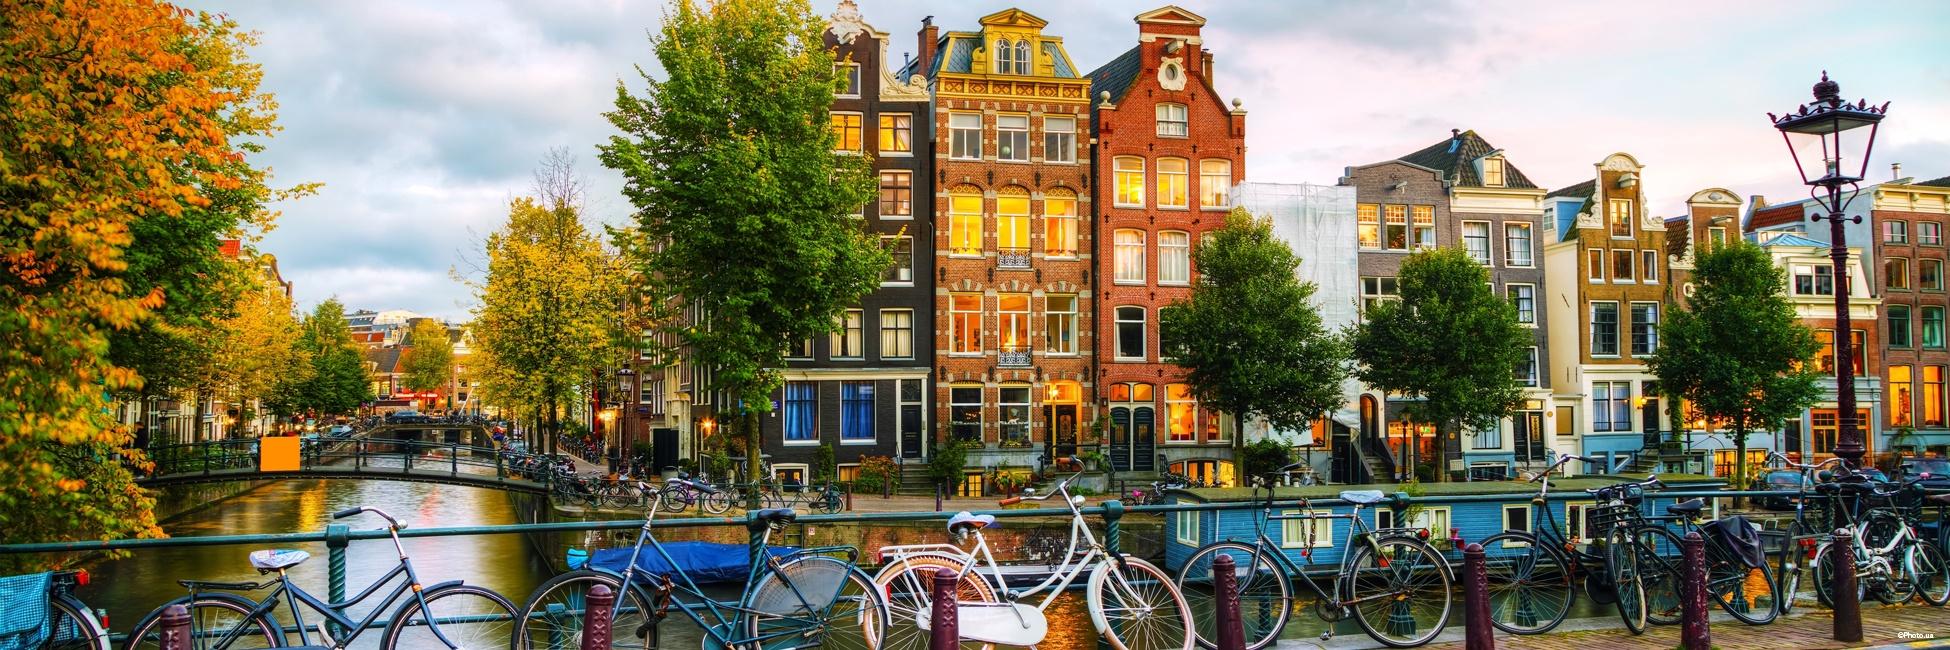 pays-bas-elbe-amsterdam-photoua